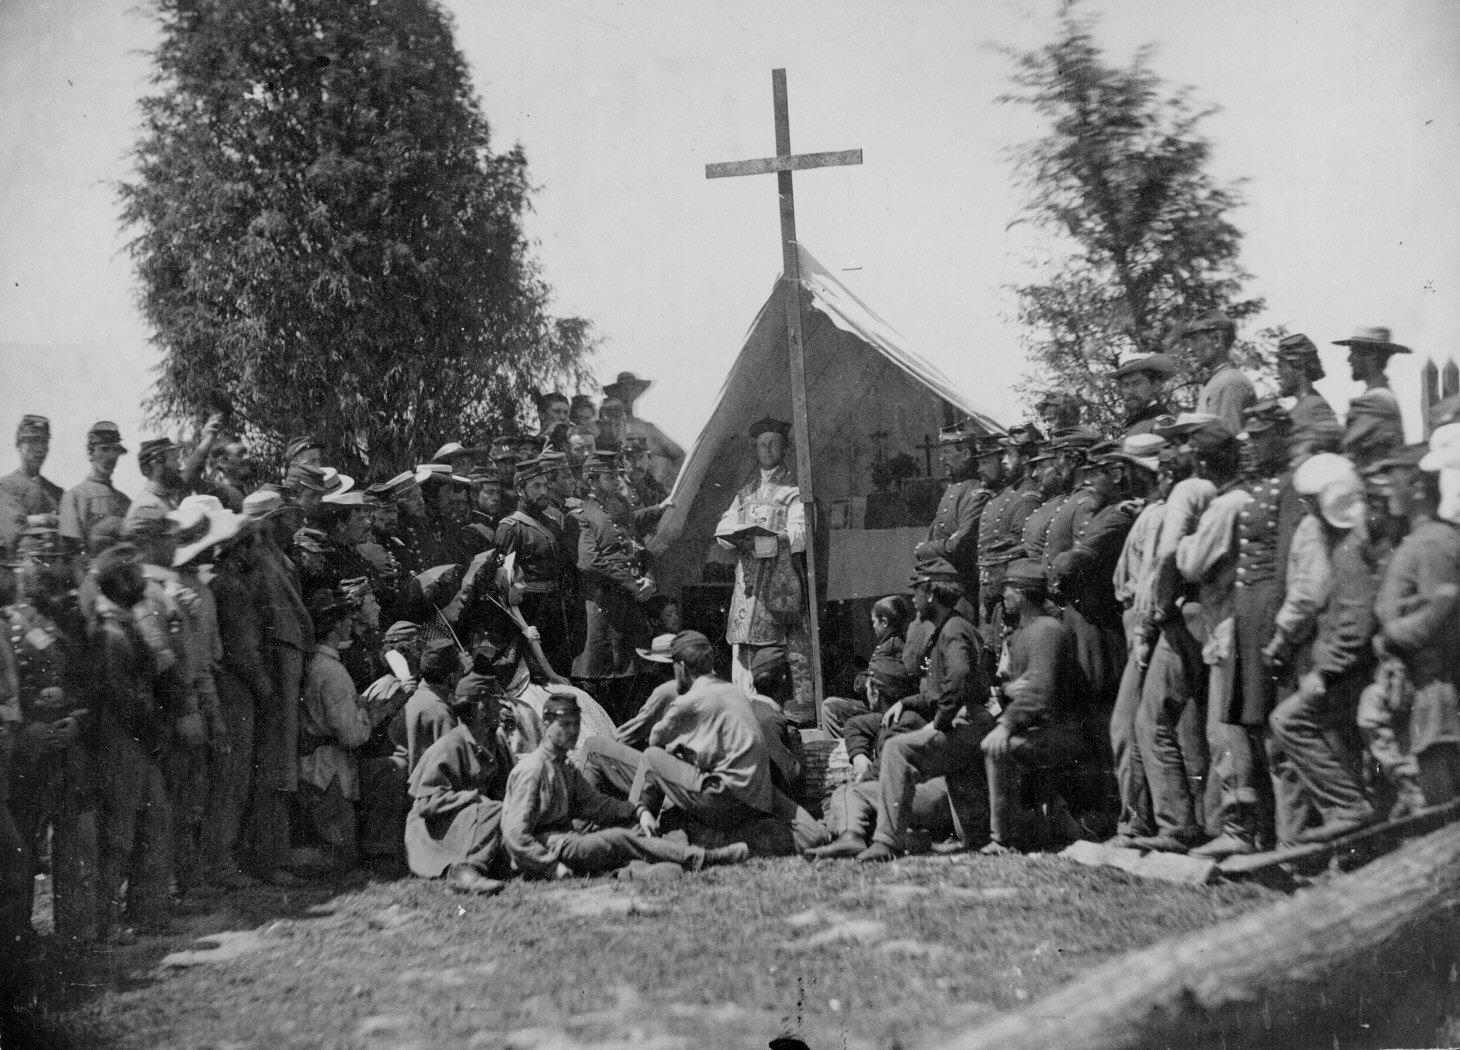 Military life during civil war